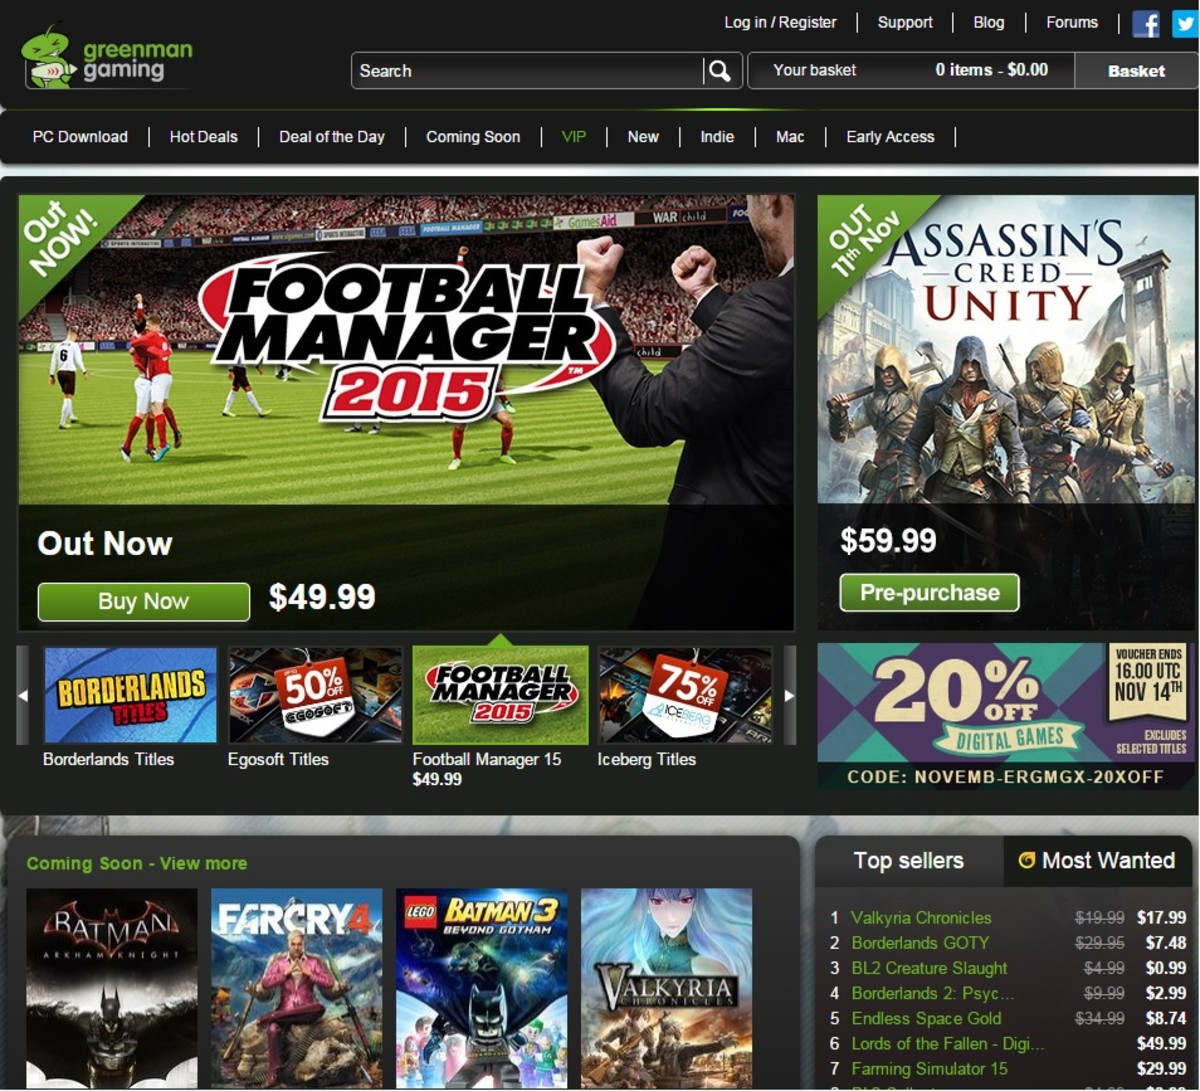 green-man-gaming-website